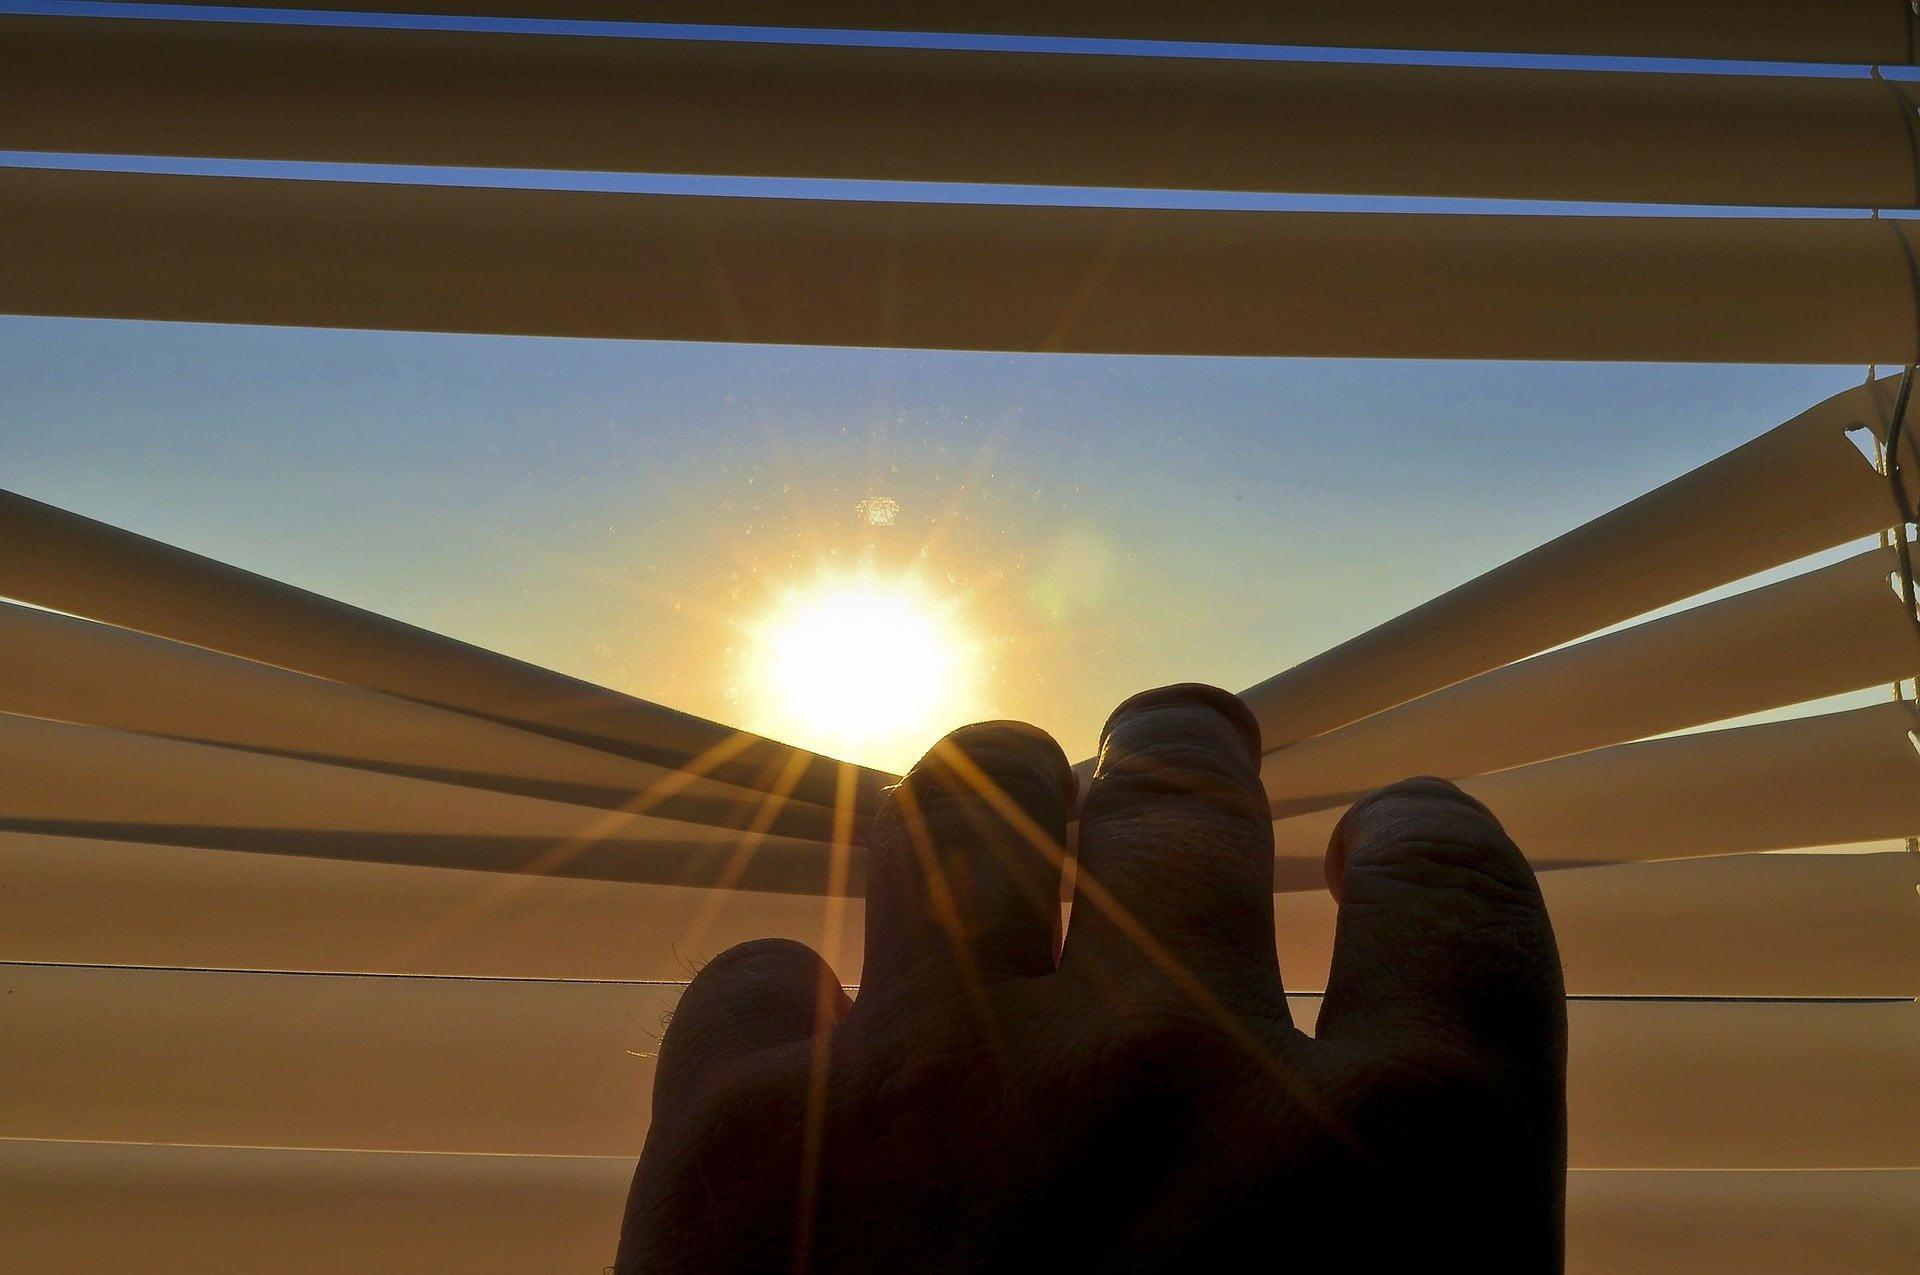 letting sunlight through blinds